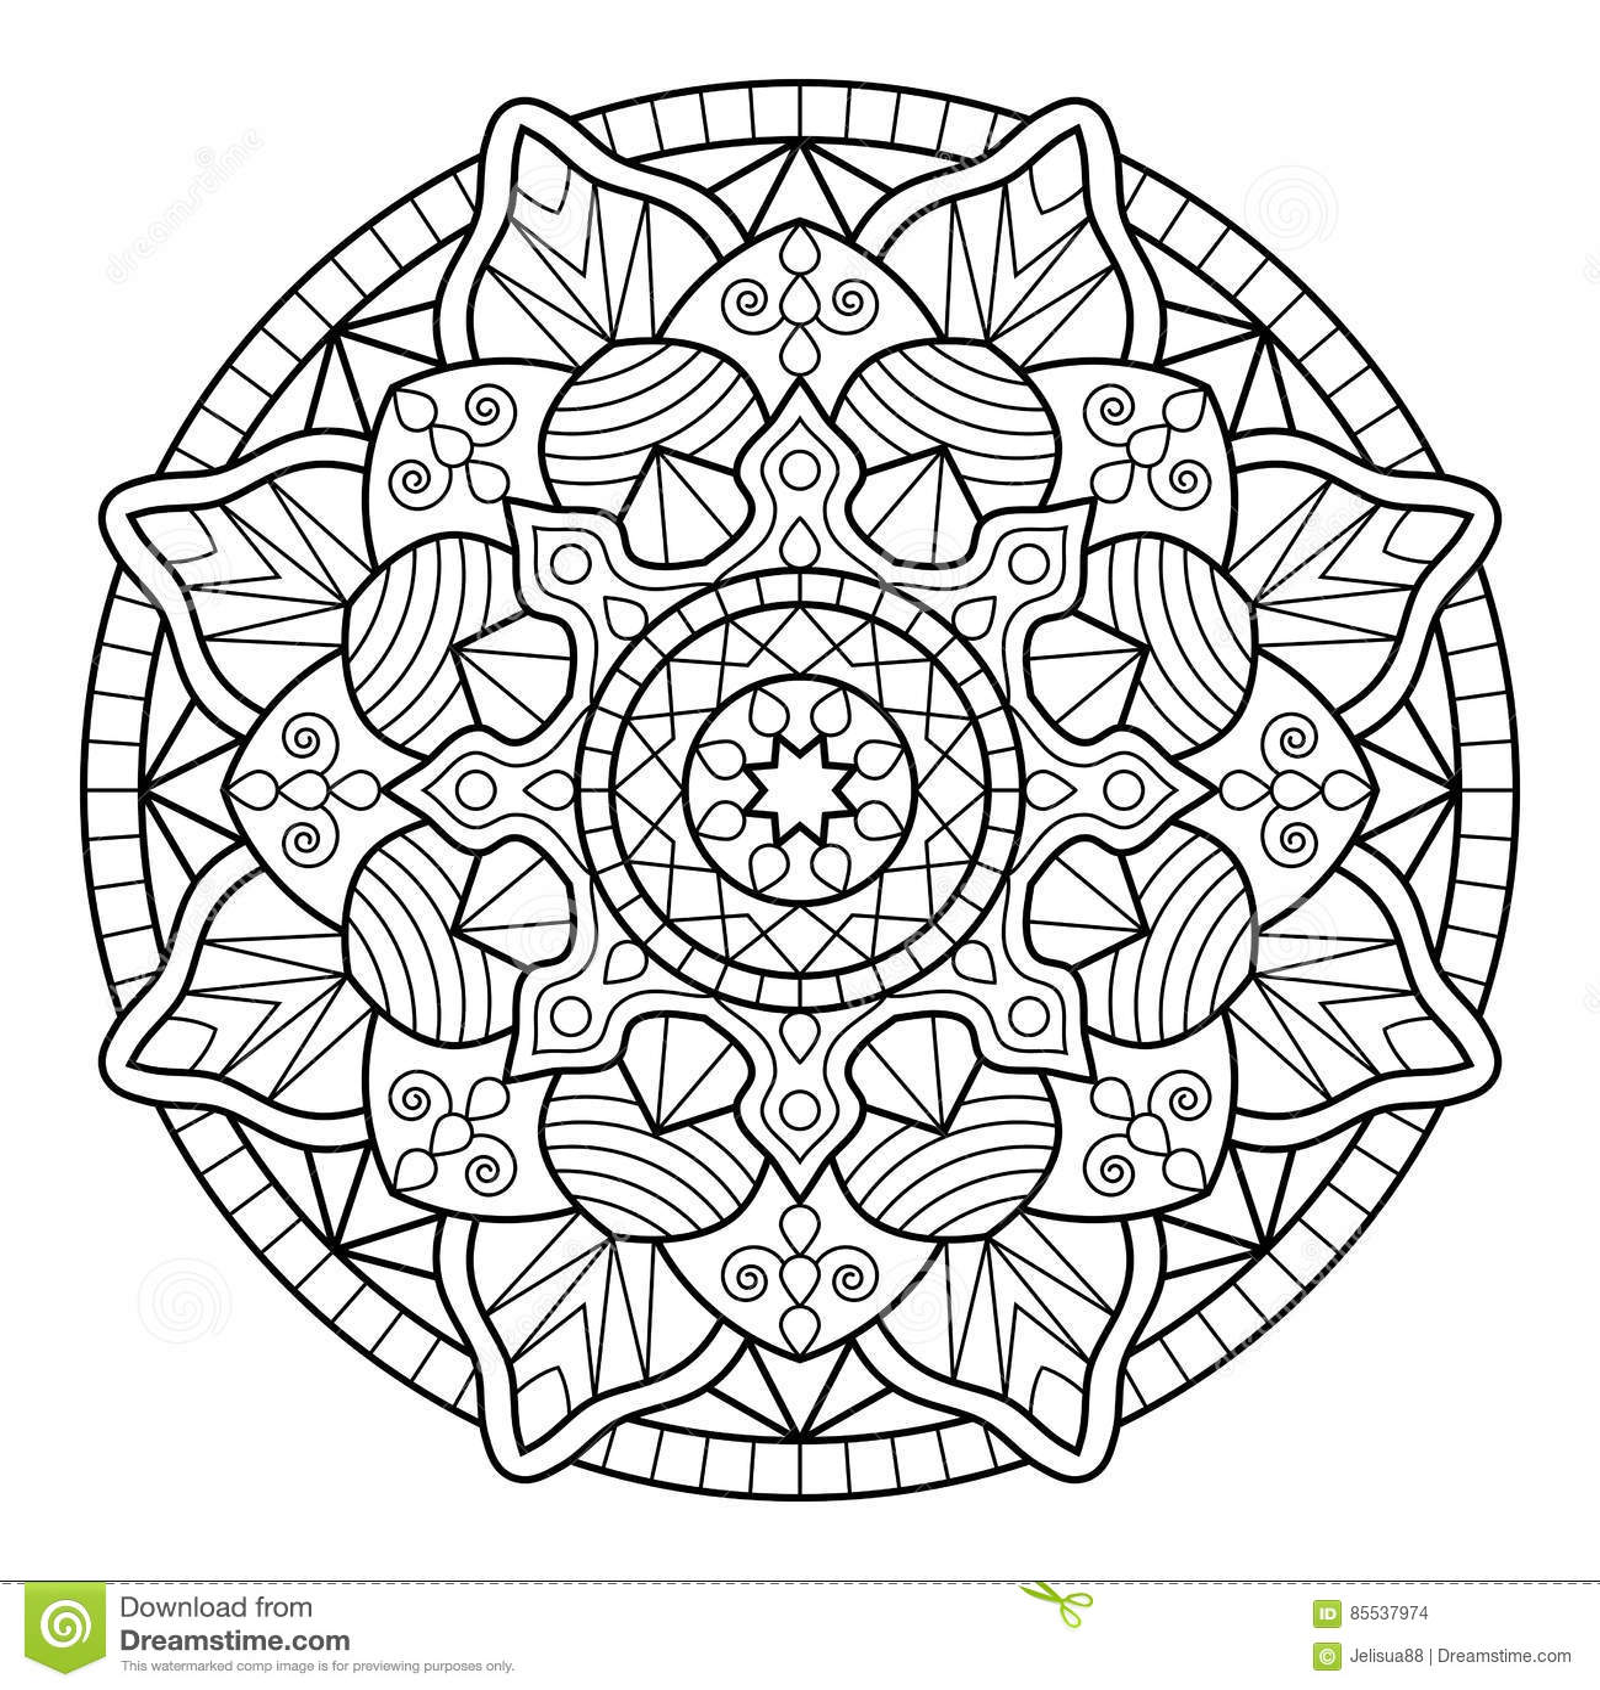 - Mandala. Coloring Book Pages Stock Vector - Illustration Of Chakra